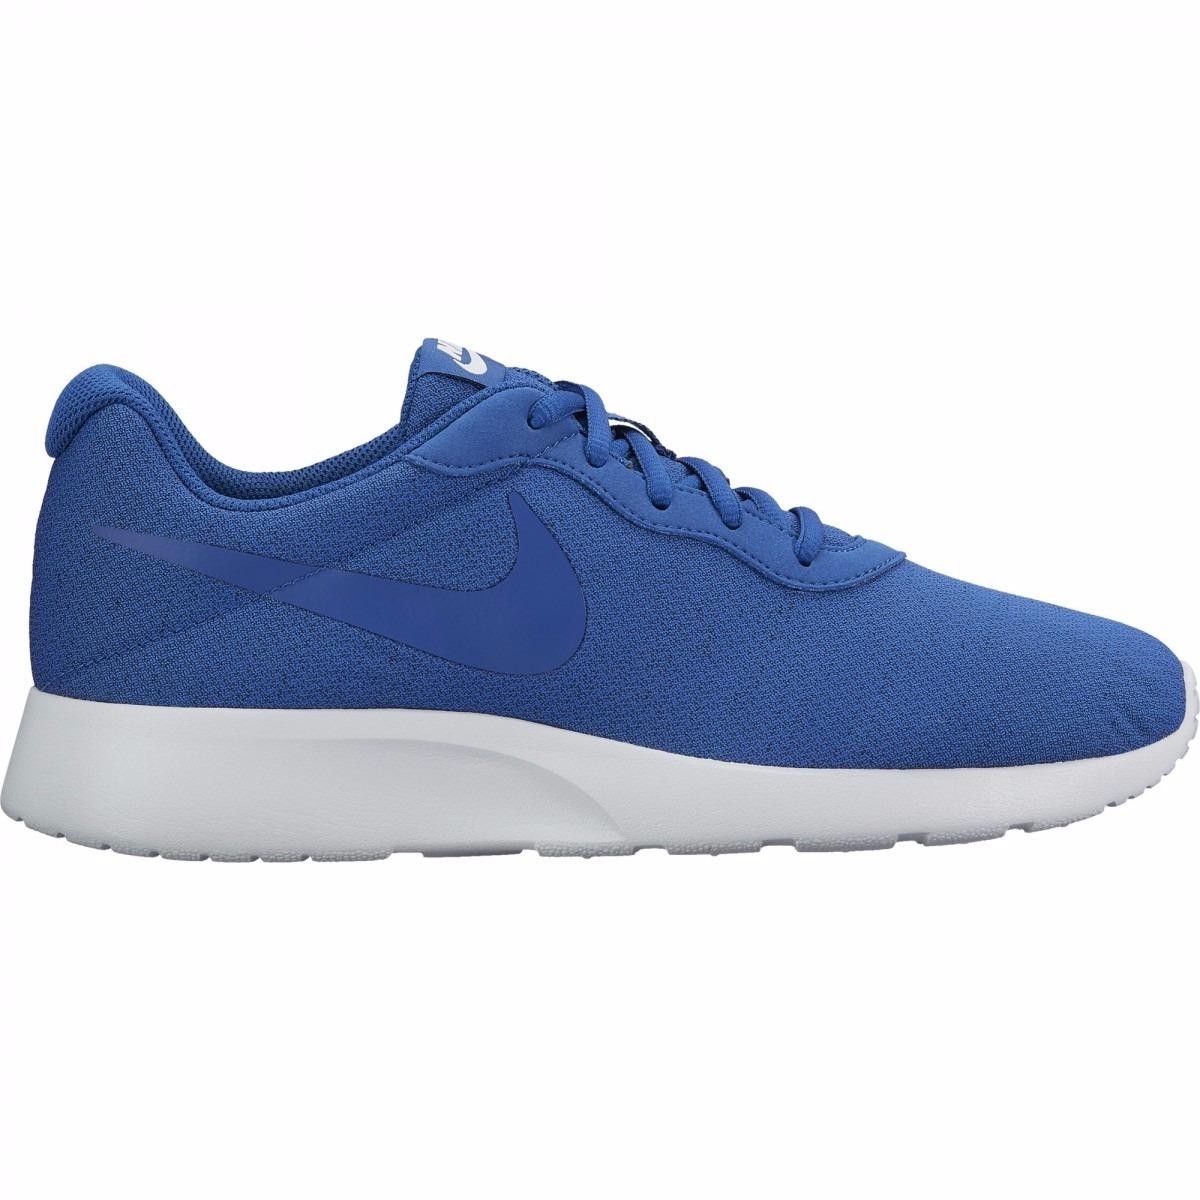 competitive price 8d775 b2bf4 ... low cost tenis nike tanjun azul caballero. cargando zoom. 6ec43 29a2d